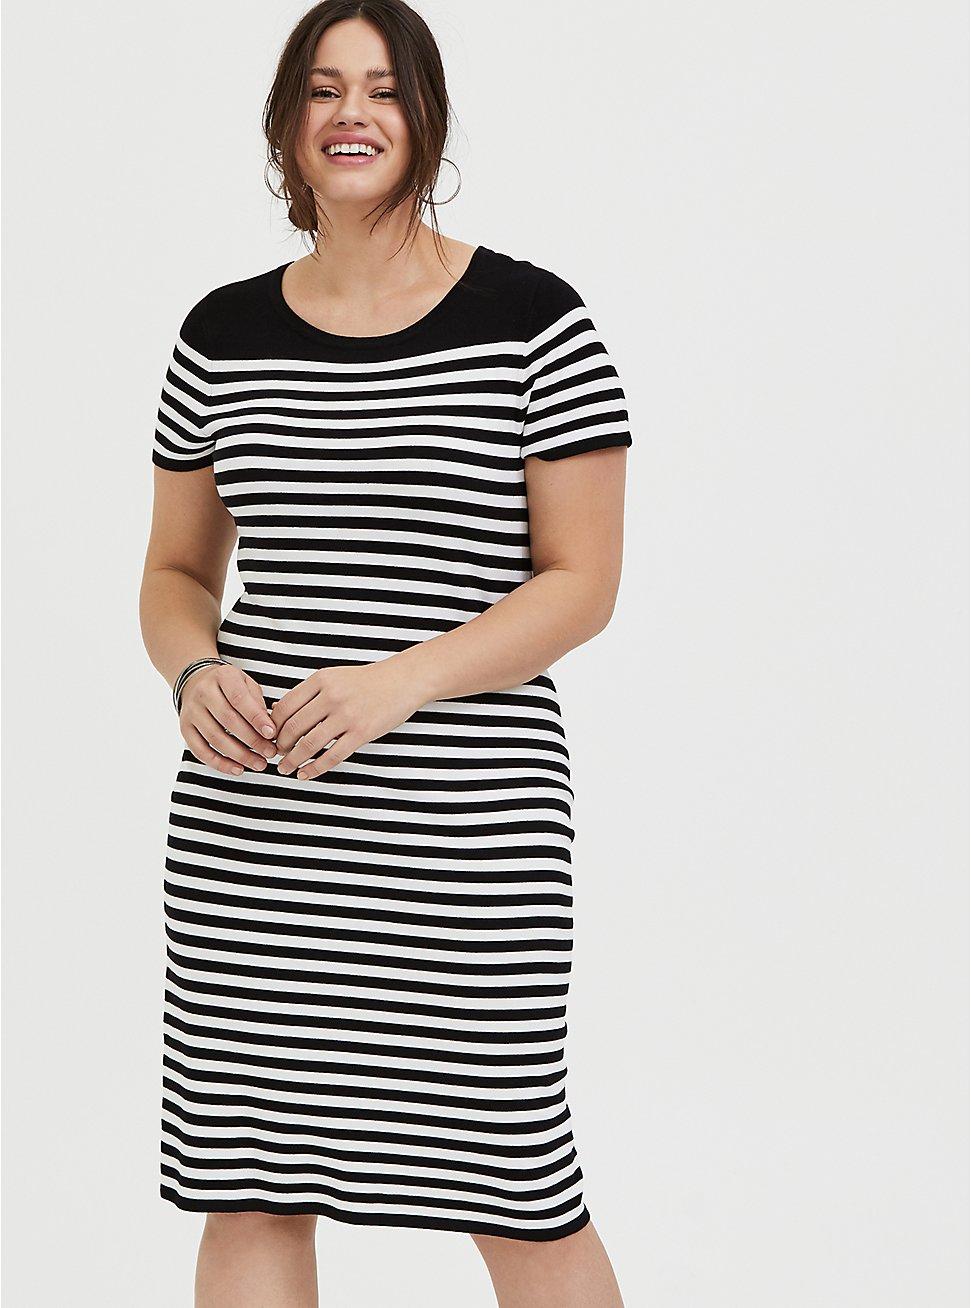 Black & White Stripe Sweater-Knit Short Shift Dress, , fitModel1-hires